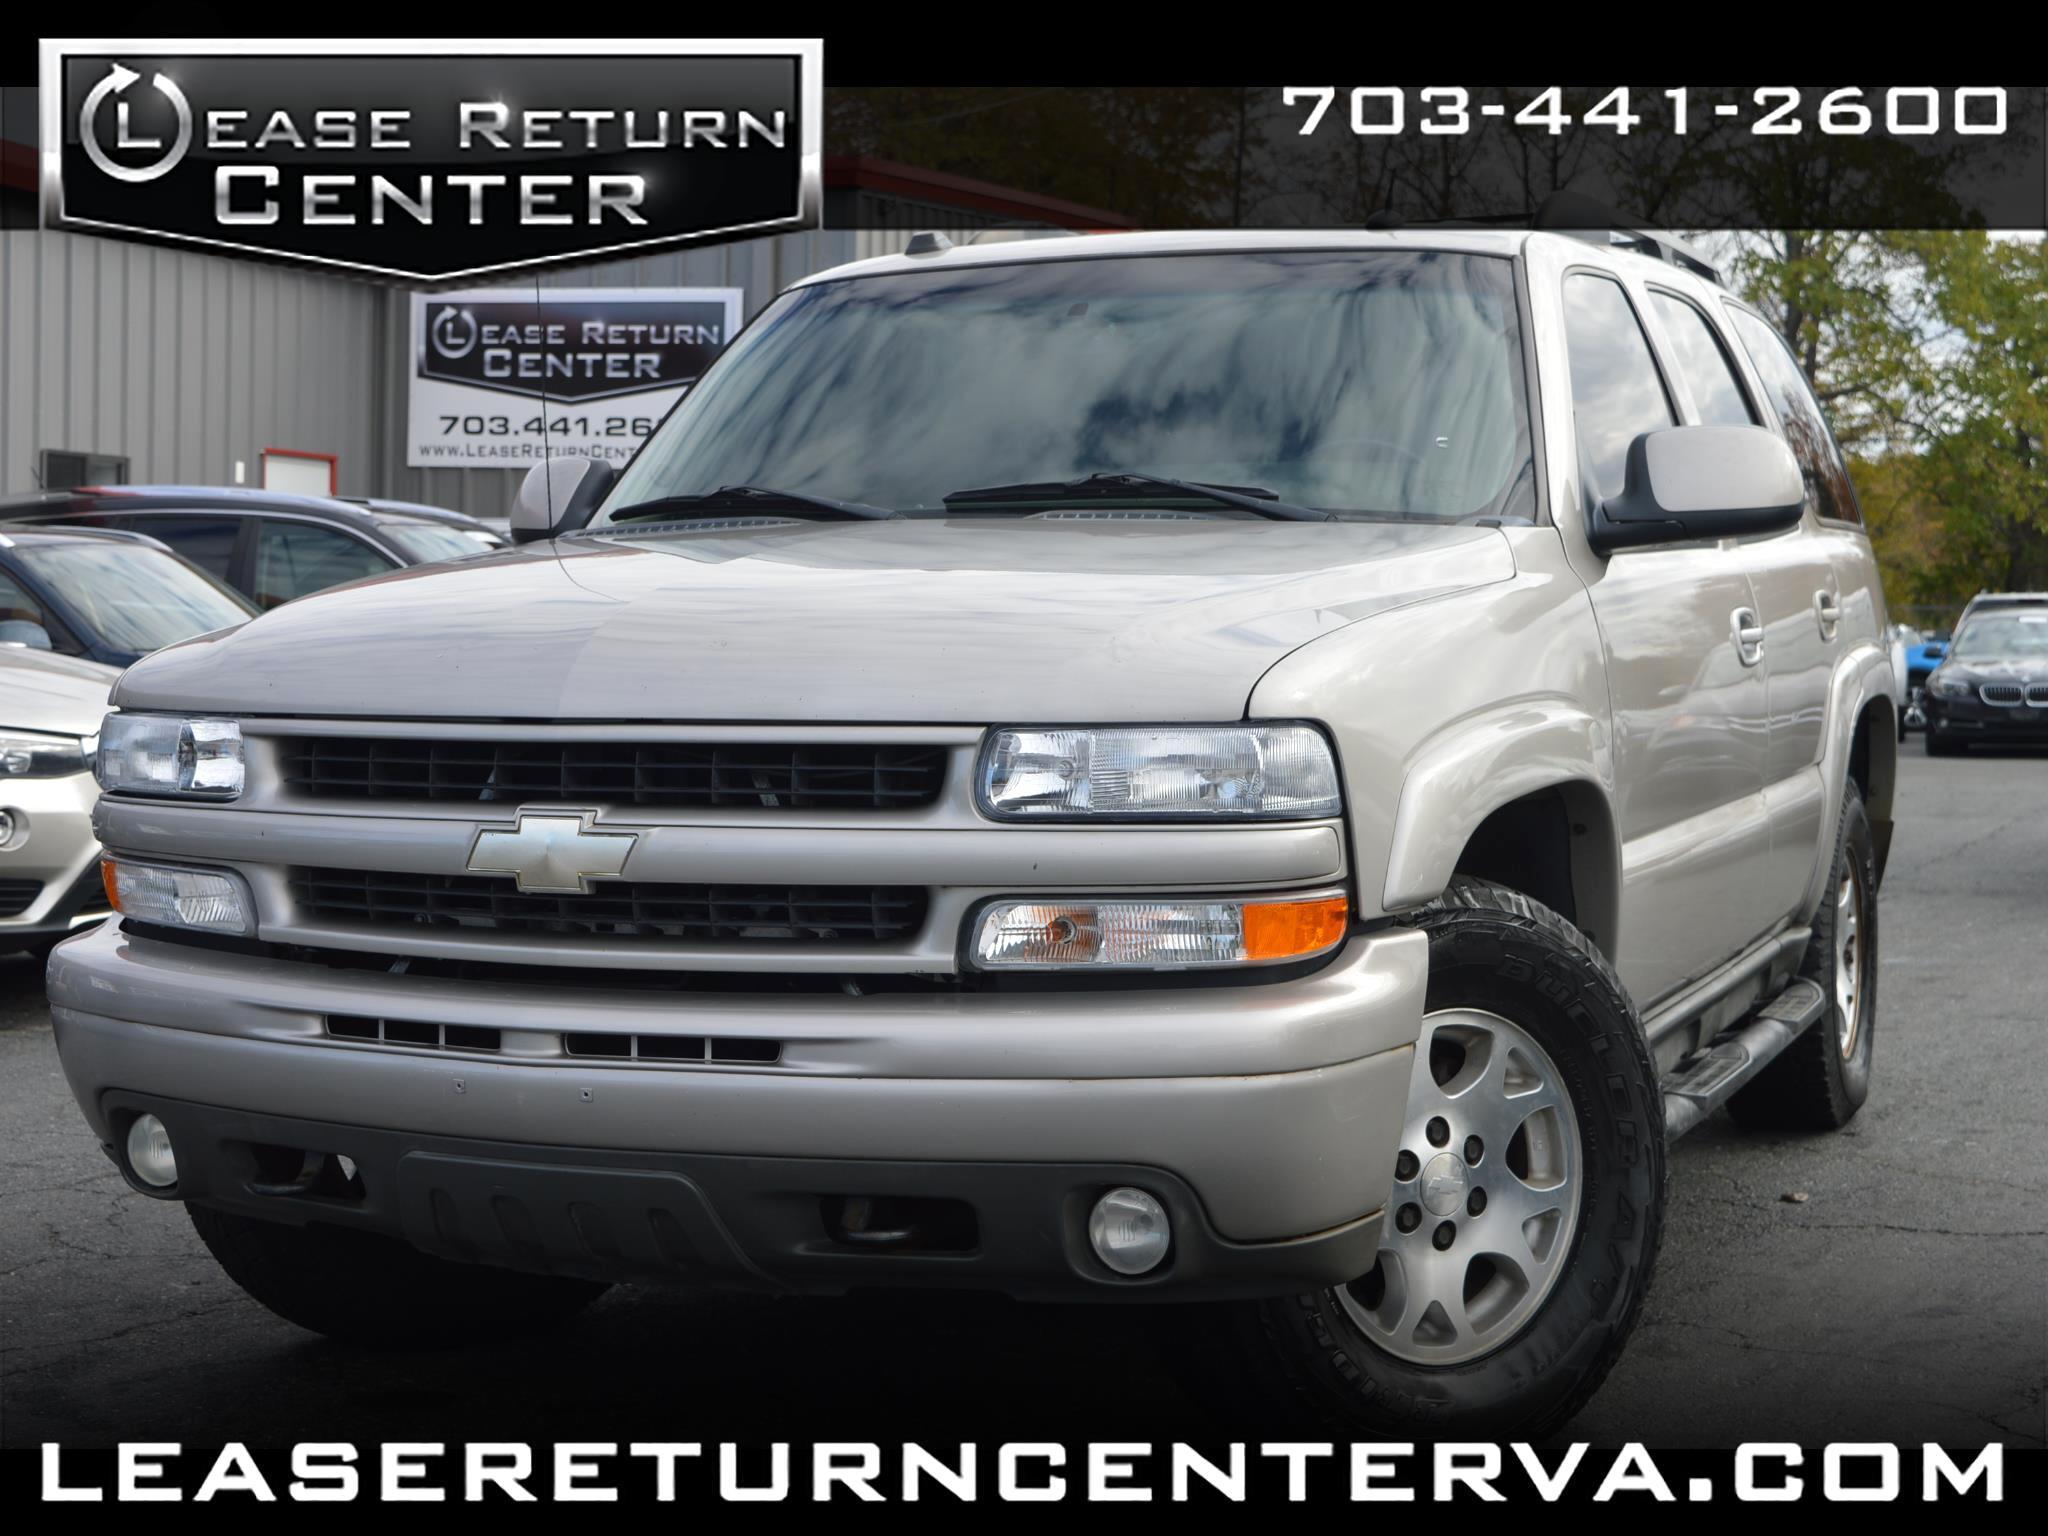 2005 Chevrolet Tahoe 4X4**Z71**CPT CHAIRS**NAVI**DVD**